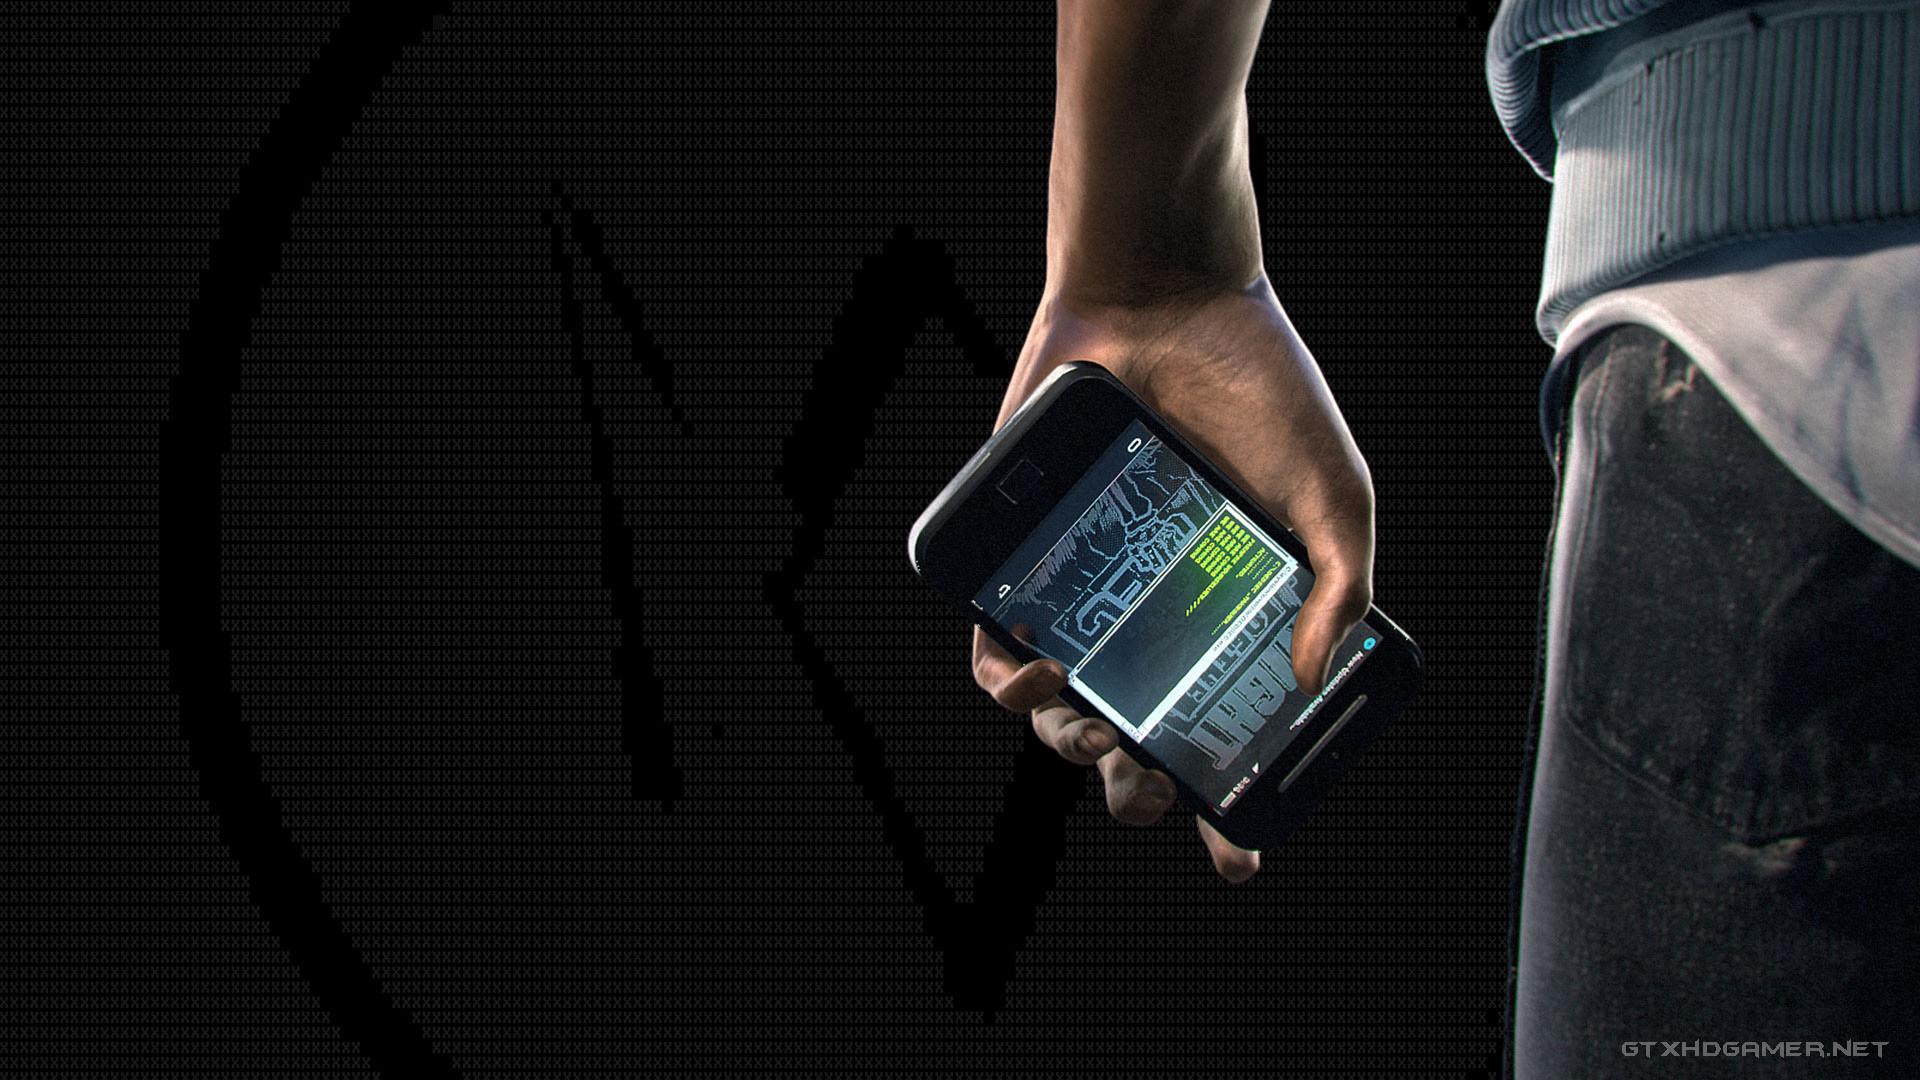 … Watch Dogs 2 Wallpaper – Smartphone